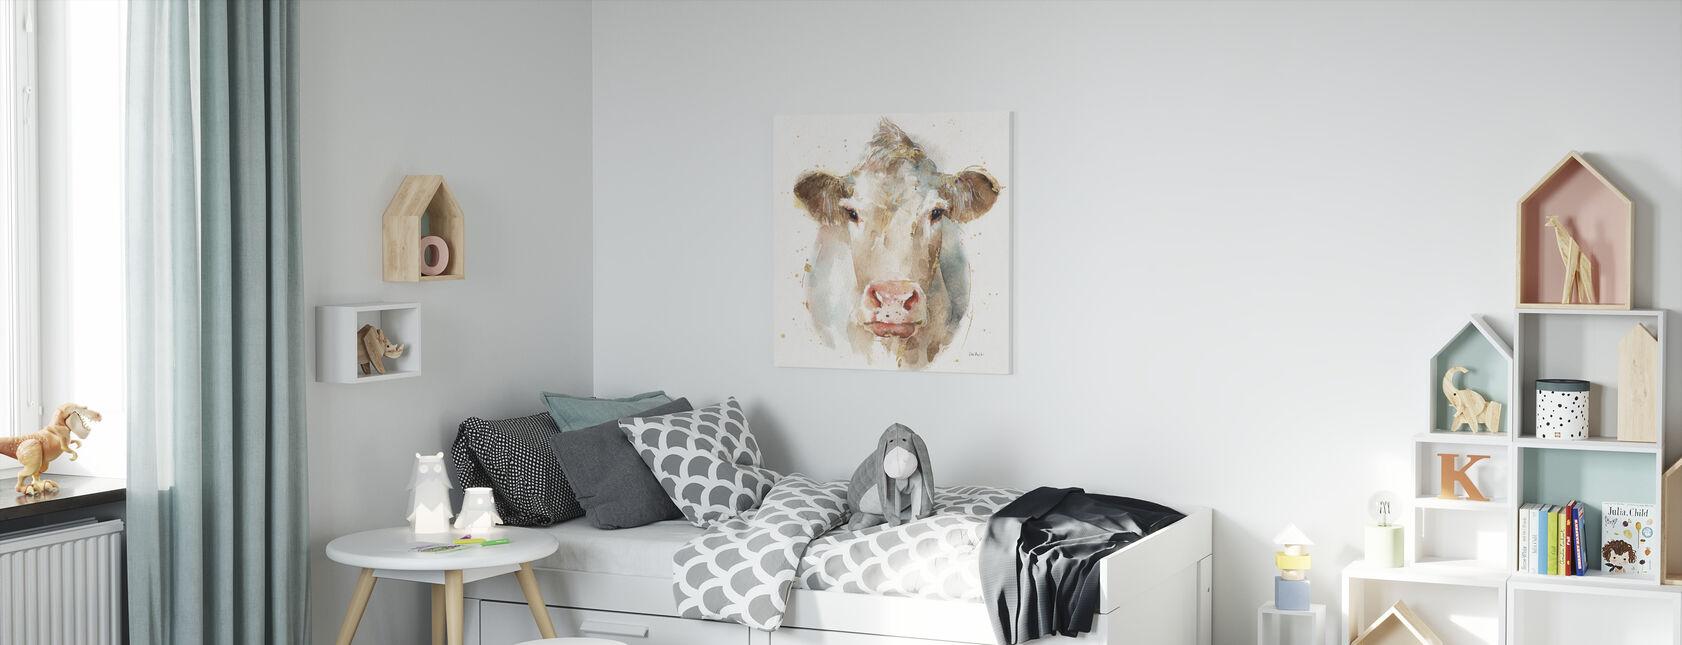 Boerderij Vrienden I - Canvas print - Kinderkamer